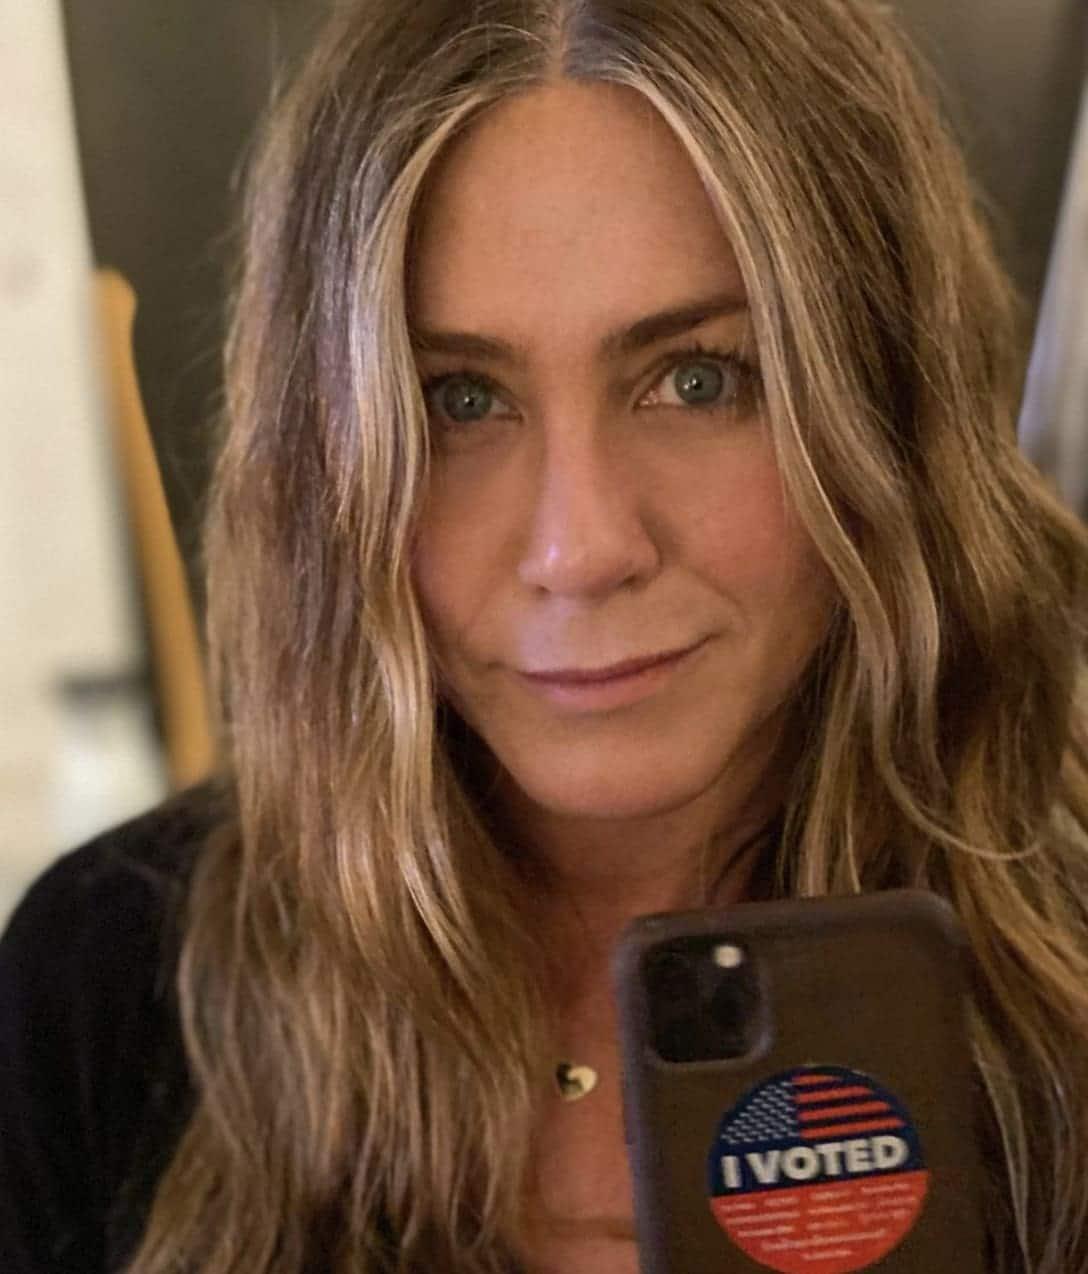 Jennifer Aniston Voter Selfie 1